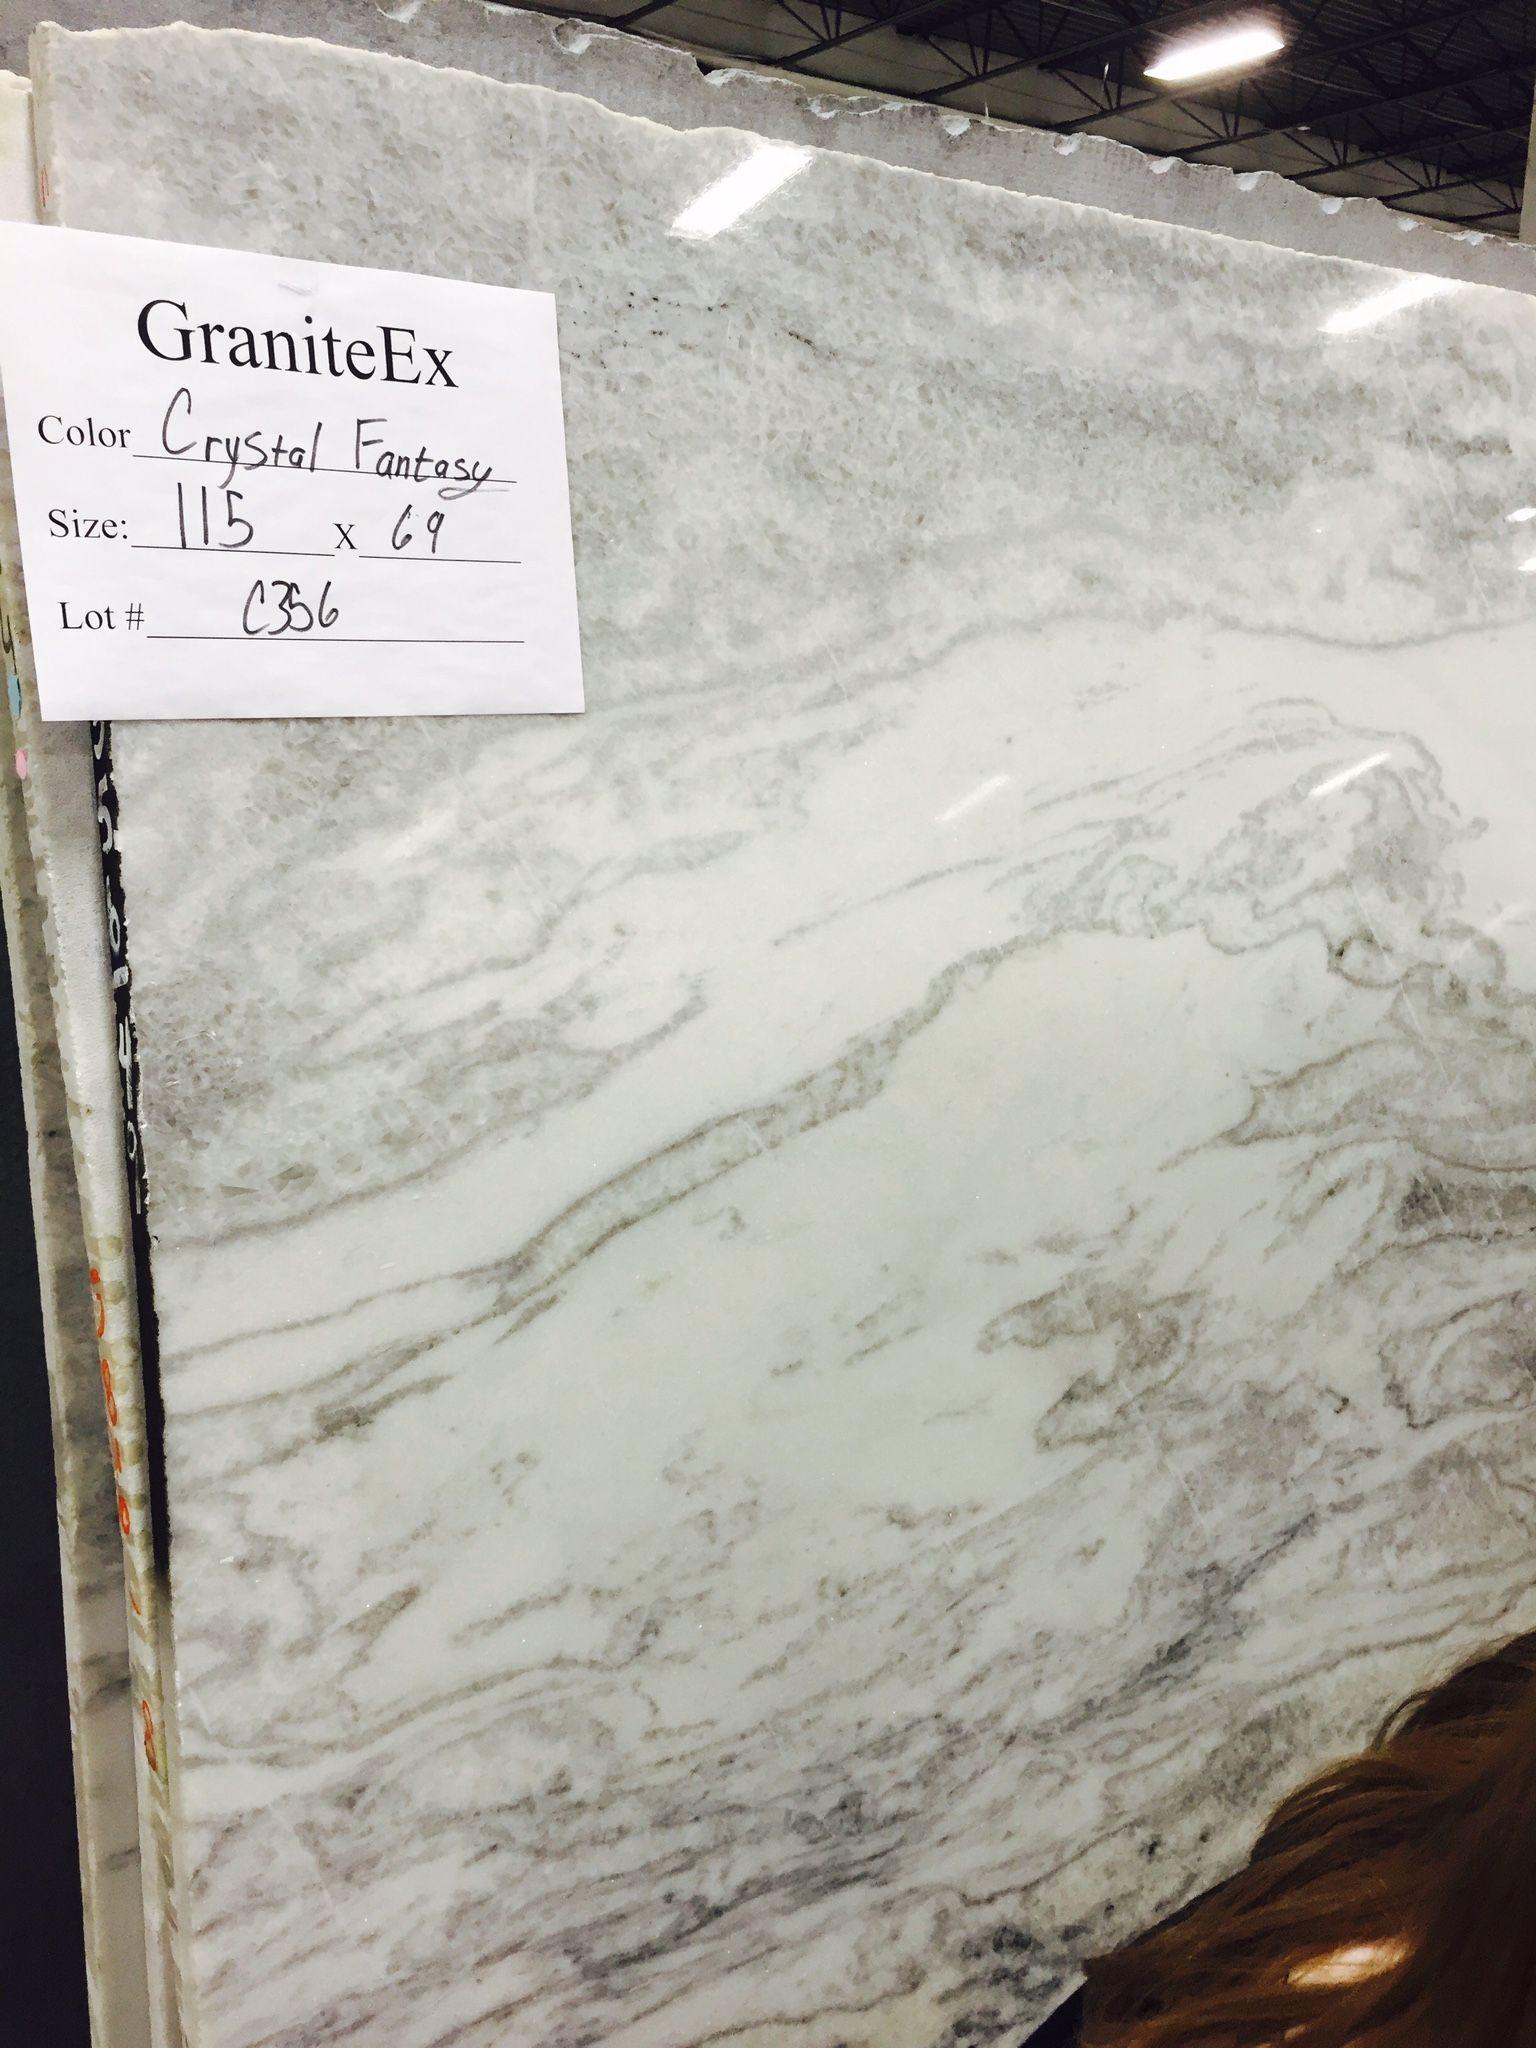 Lapidus premium product search marva marble and granite - Crystal Fantasy Granite Crystalfantasy